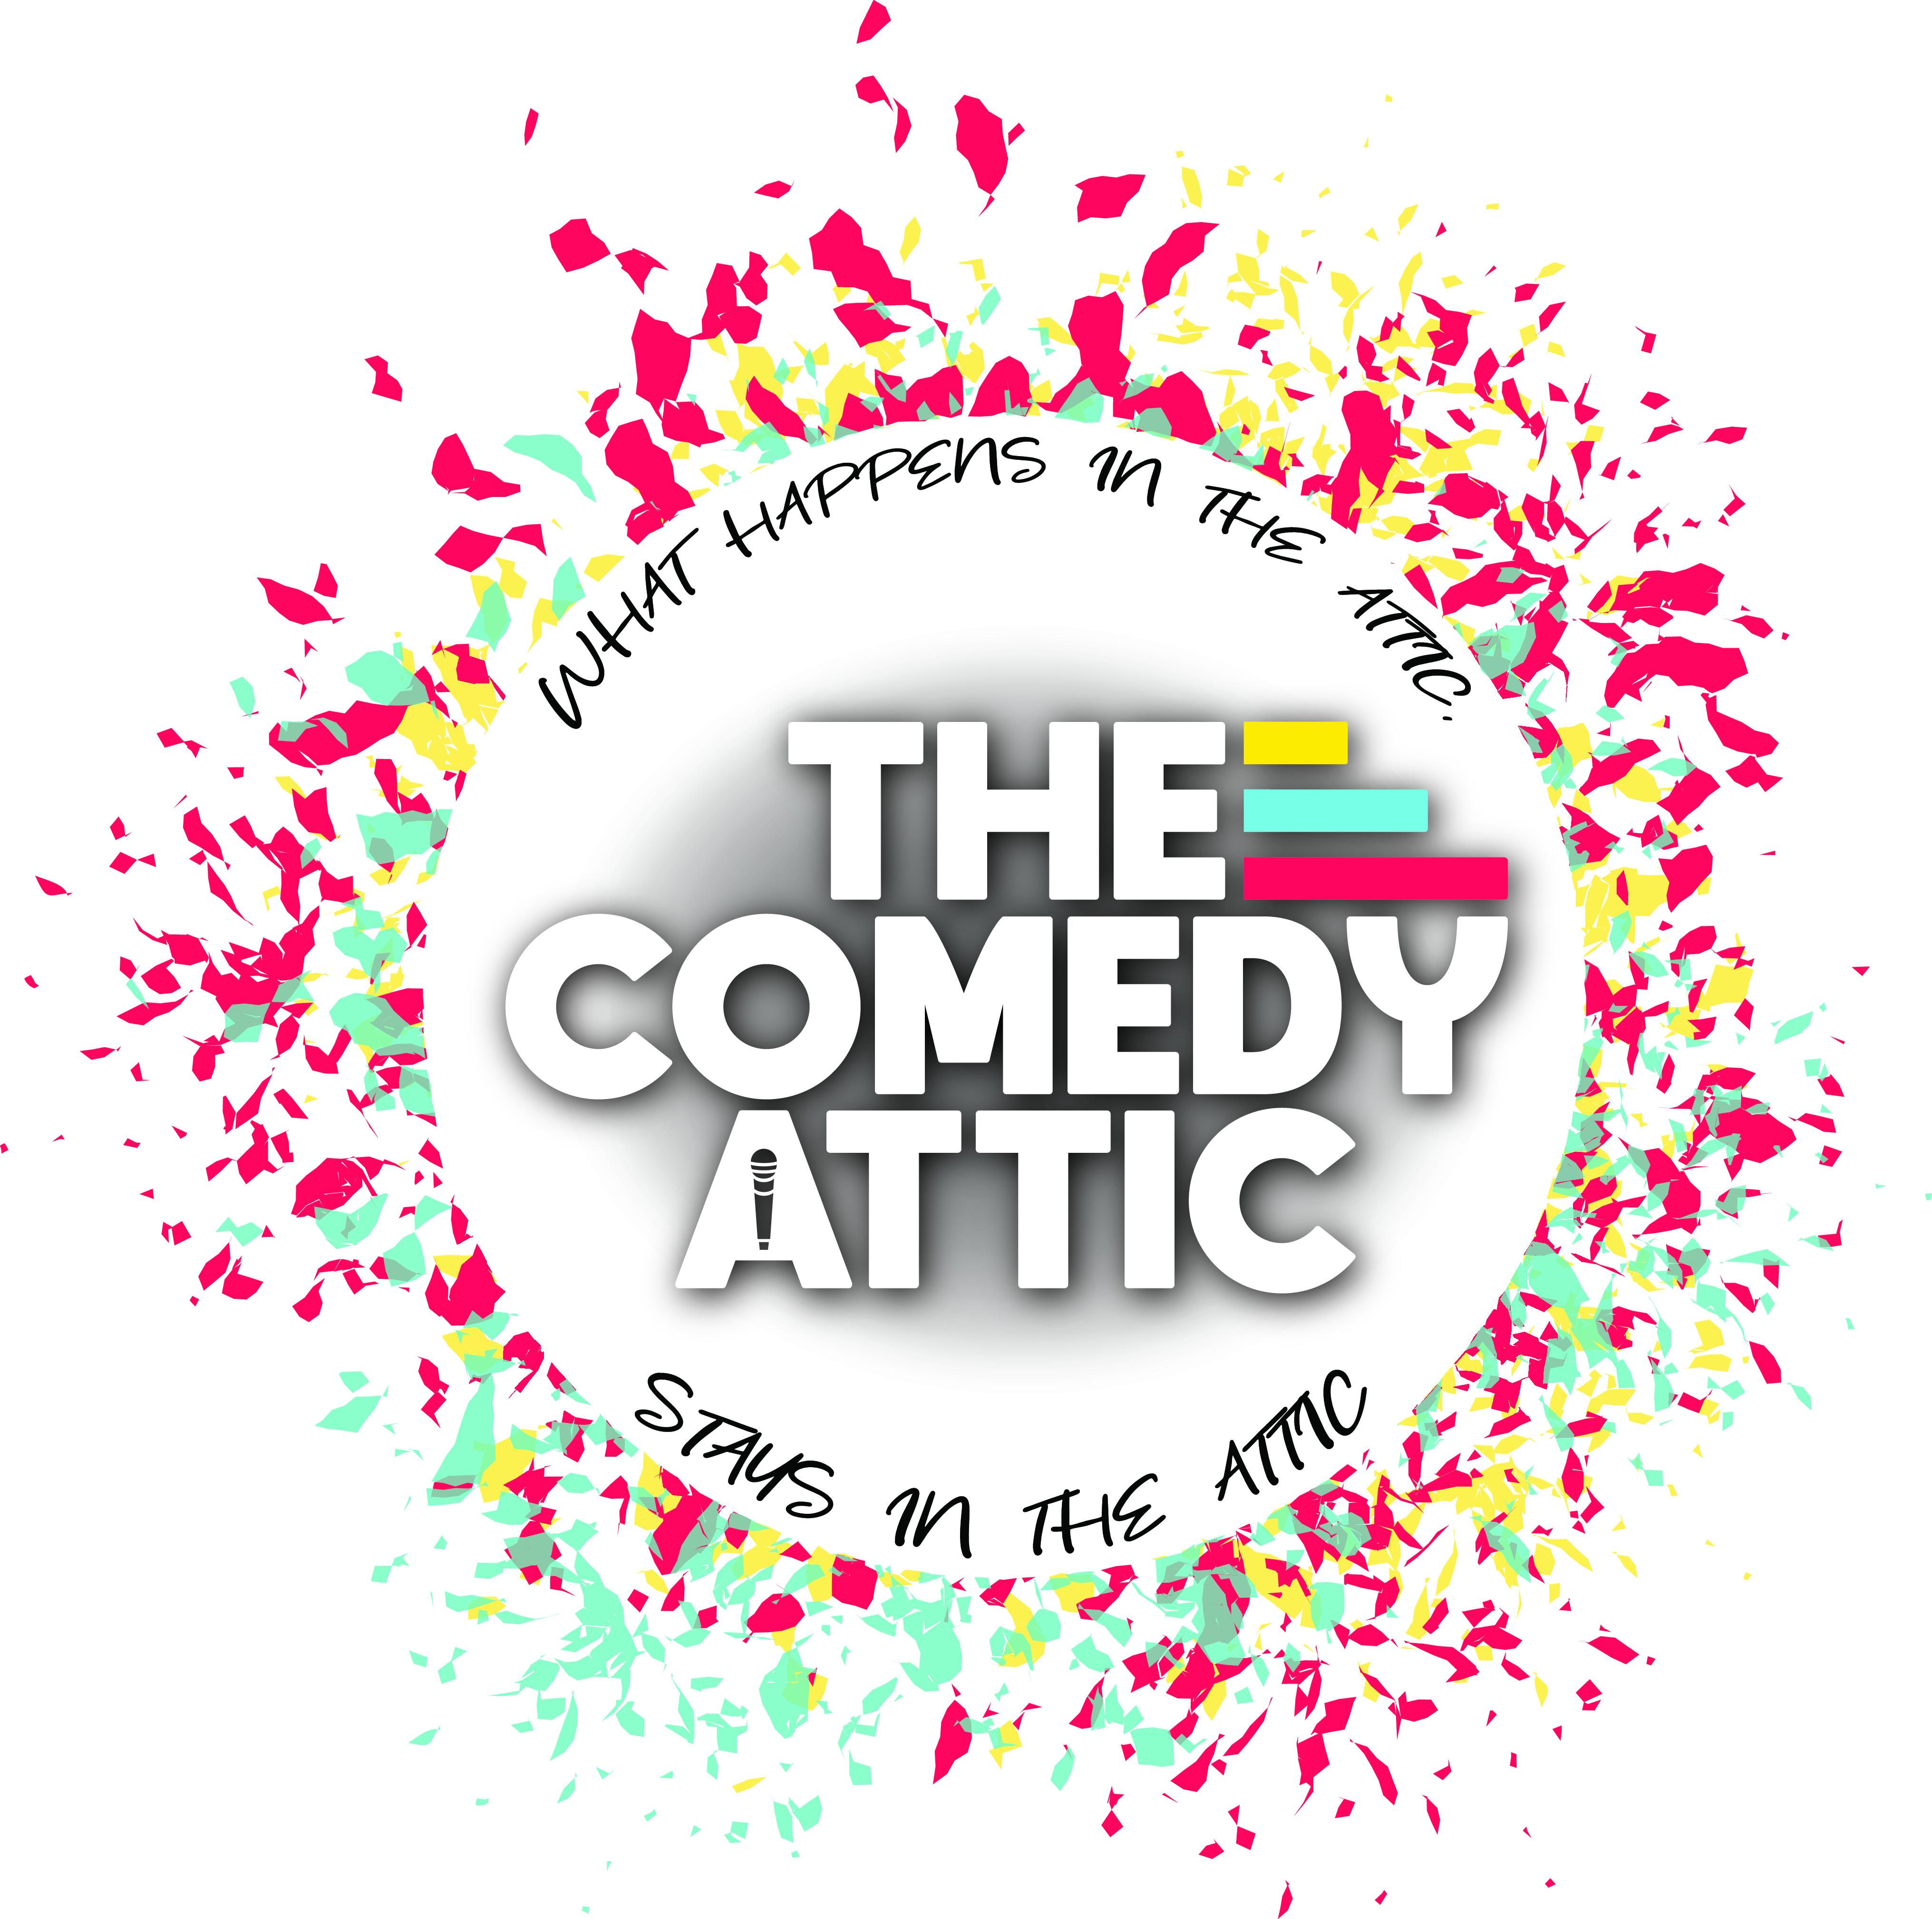 The comedy attic edinburgh jokepit comedy tickets